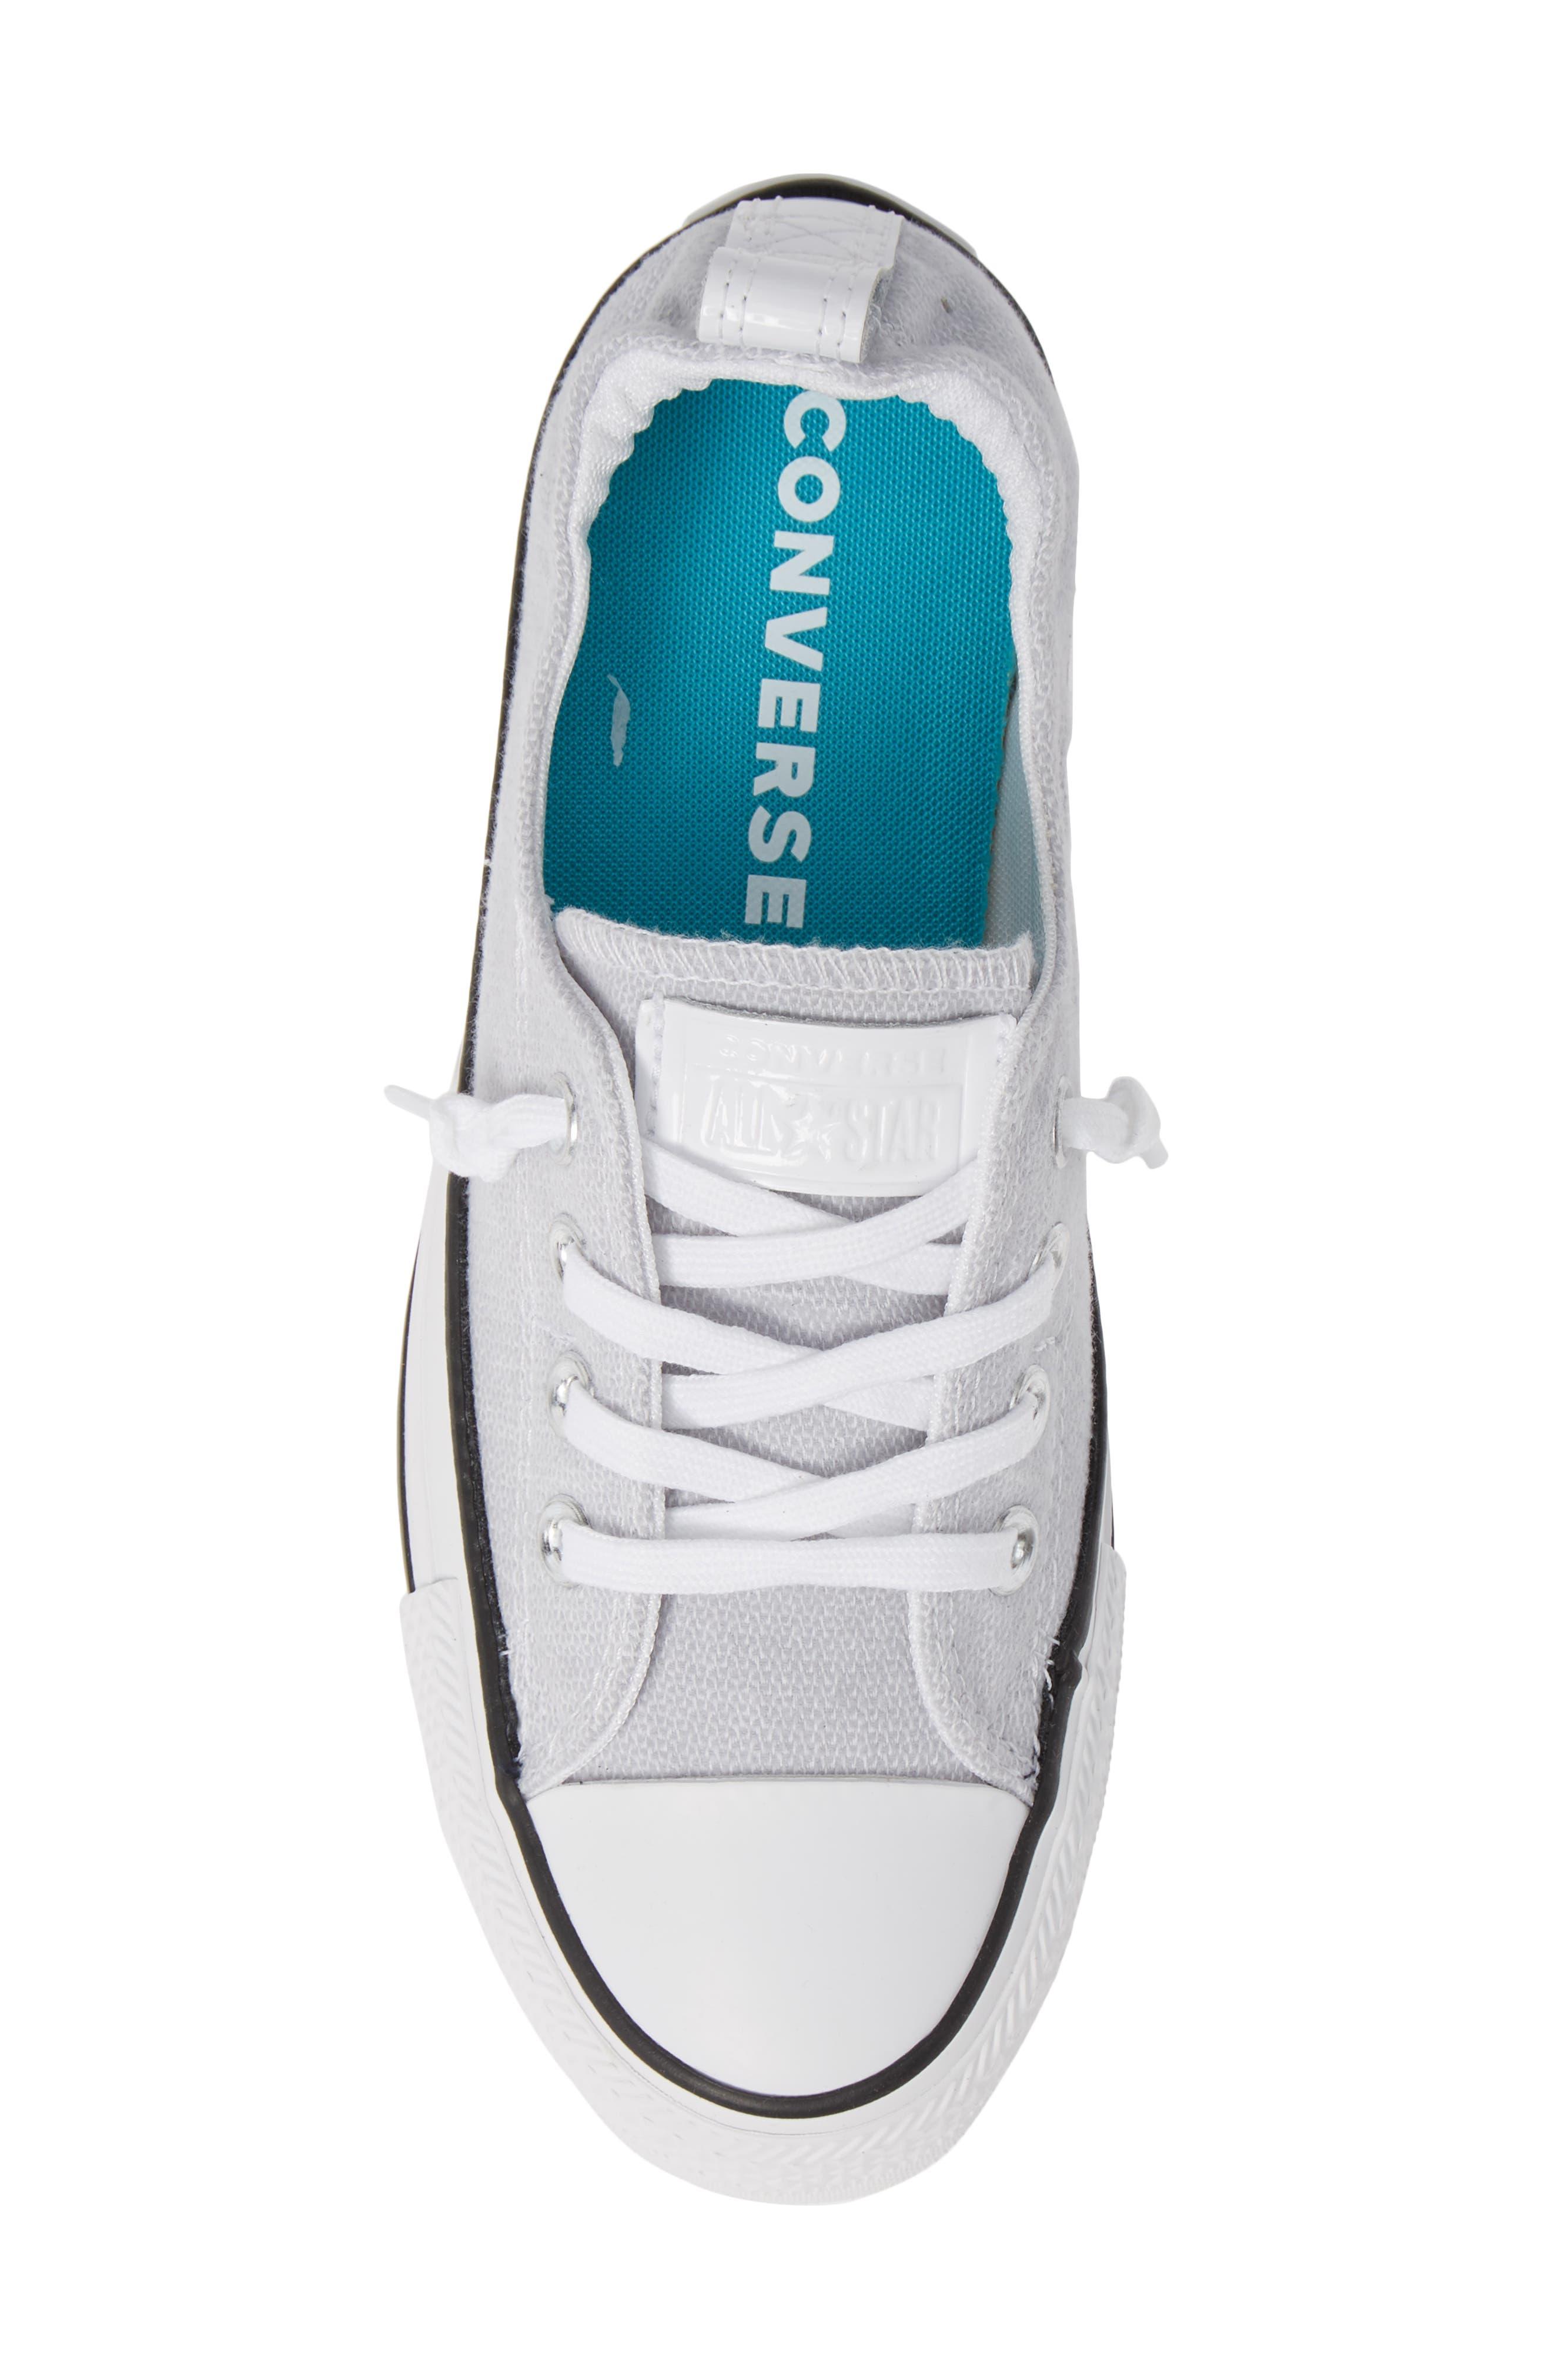 CONVERSE, Chuck Taylor<sup>®</sup> 'Shoreline' Sneaker, Alternate thumbnail 5, color, WHITE